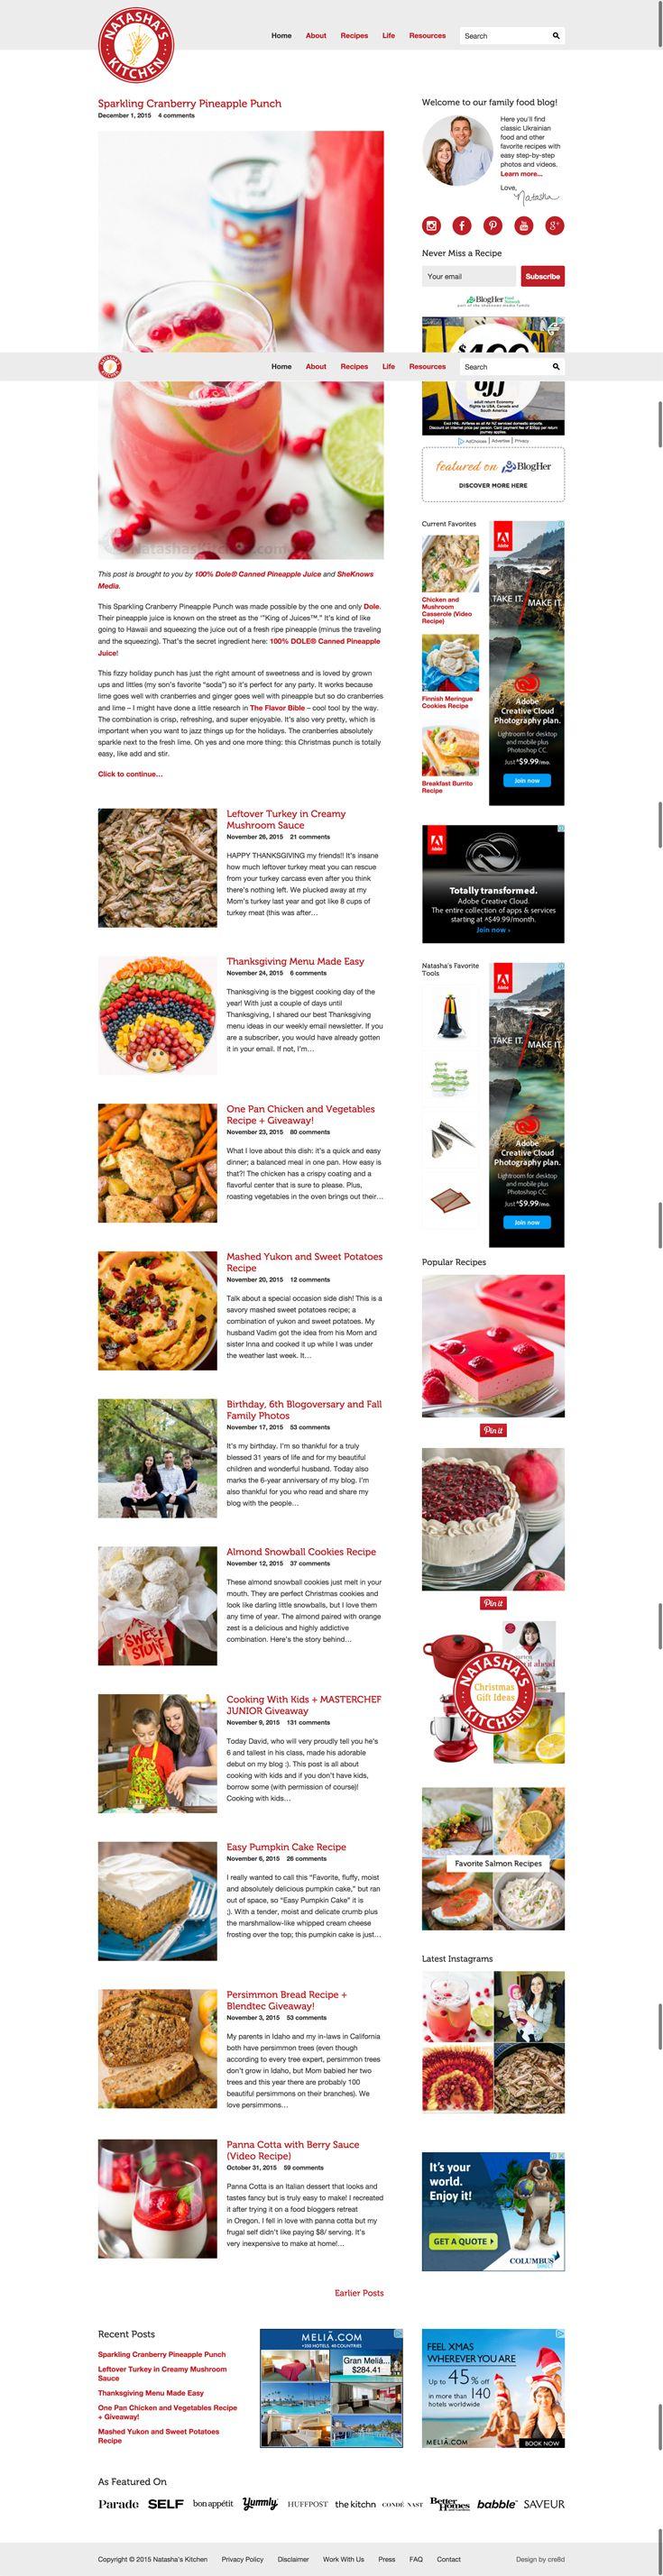 60 best food blog designs images on pinterest blog designs blog gorgeous creative food blog design for natashas kitchen custom wordpress theme designed by cre8d design forumfinder Images